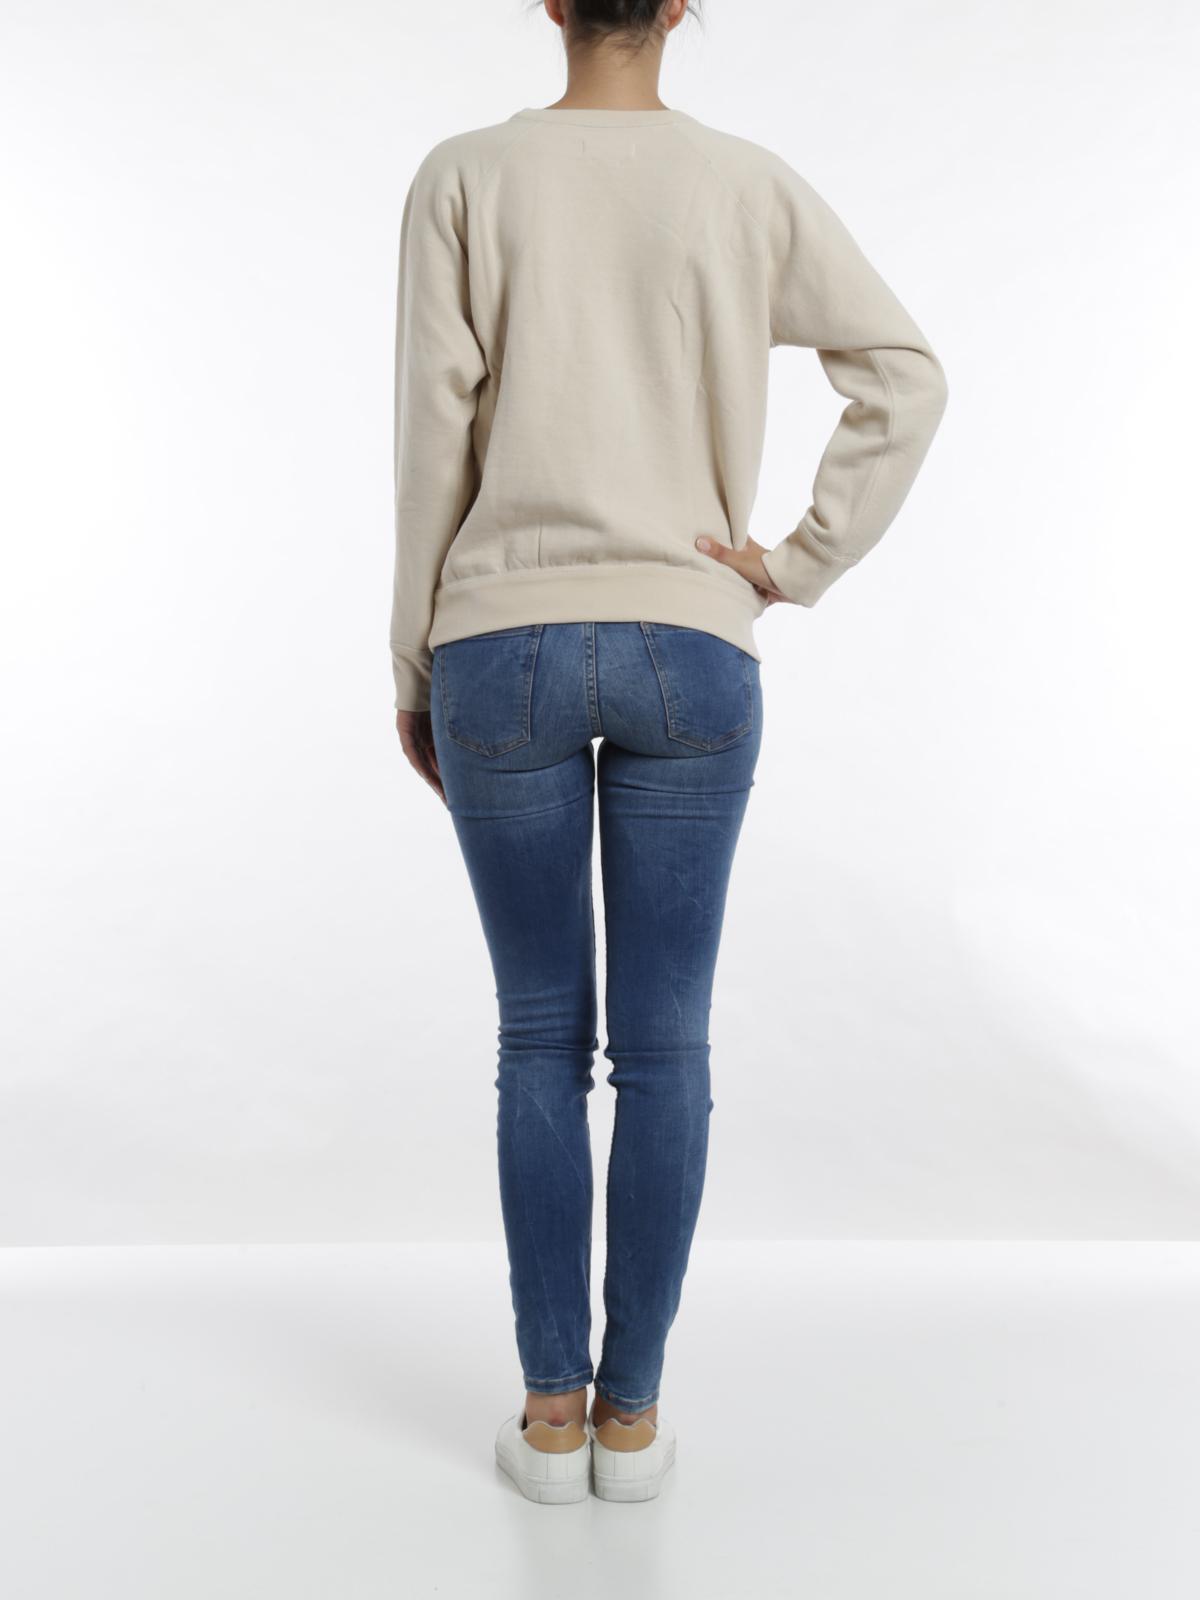 Clem sweatshirt shop online: isabel marant etoile